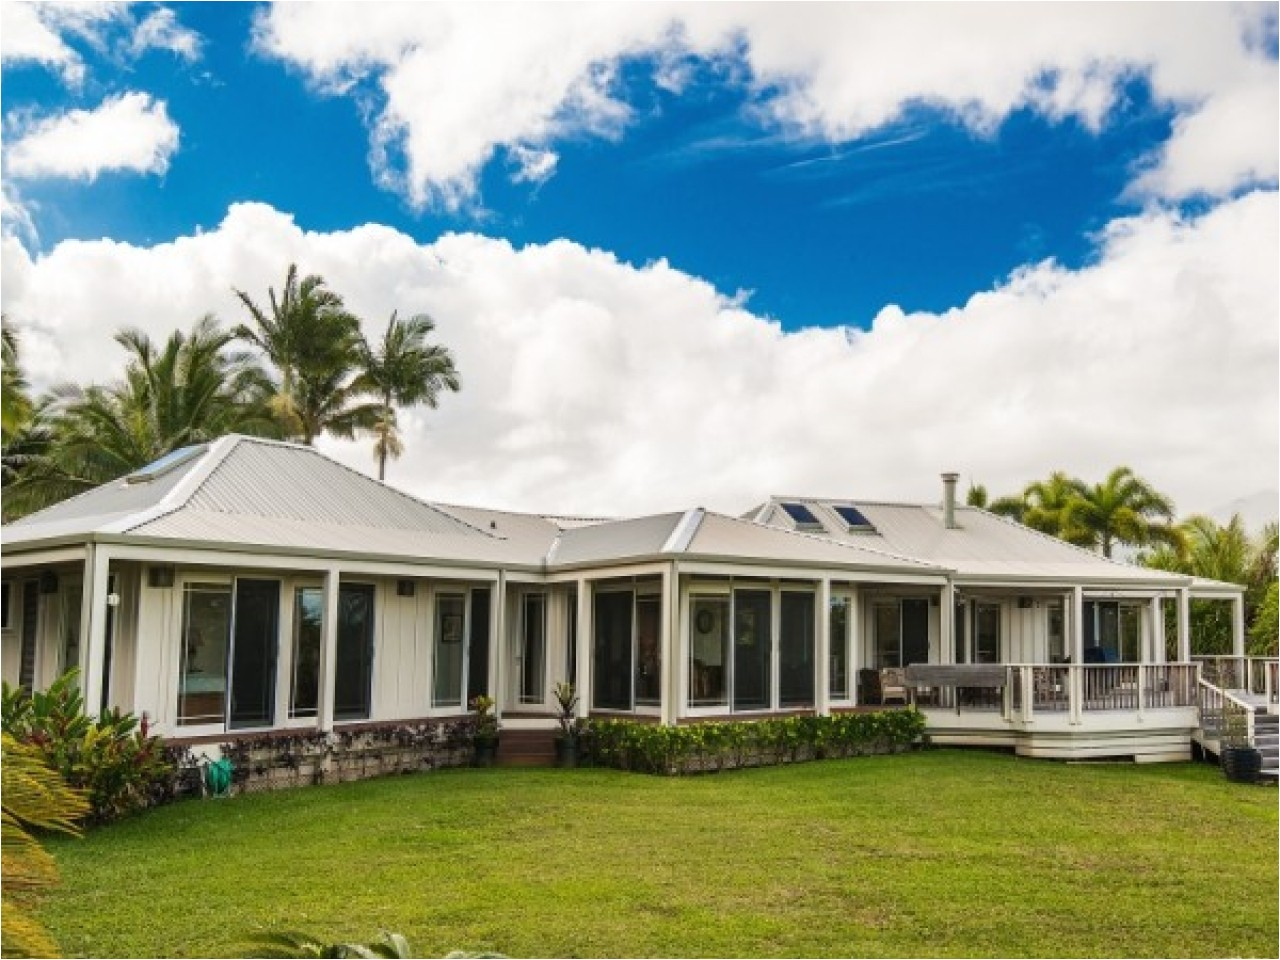 bcce229d17f2beaf hawaiian plantation architecture hawaiian plantation style home plan